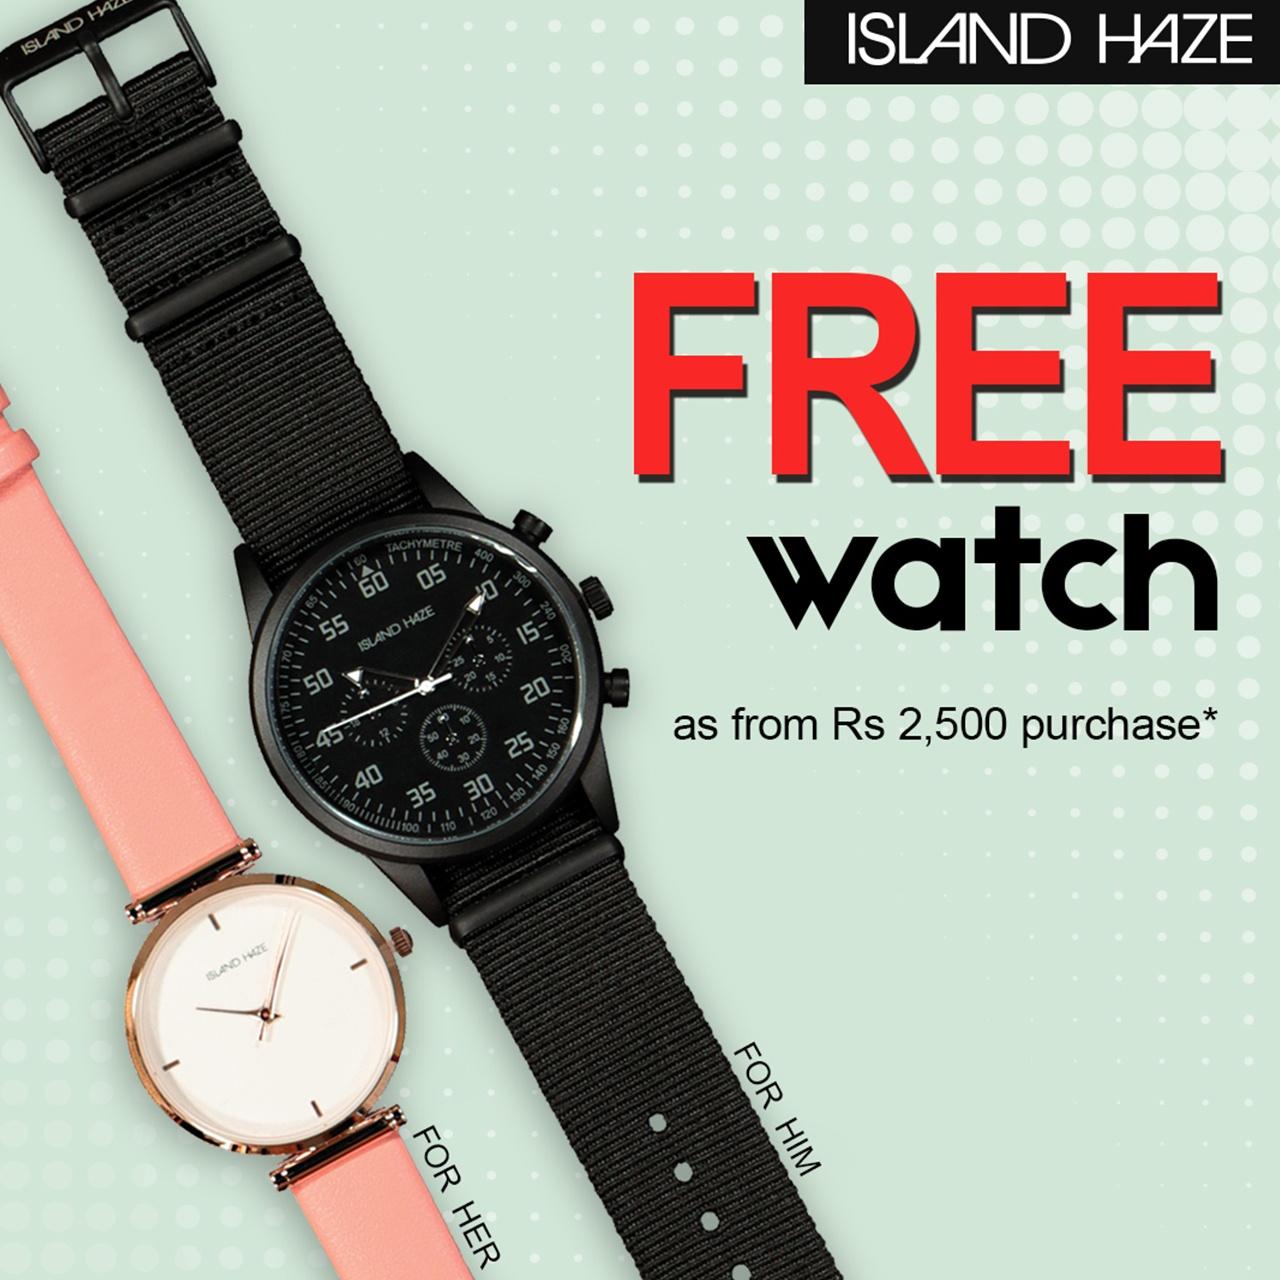 Island-Haze-MTH-promo